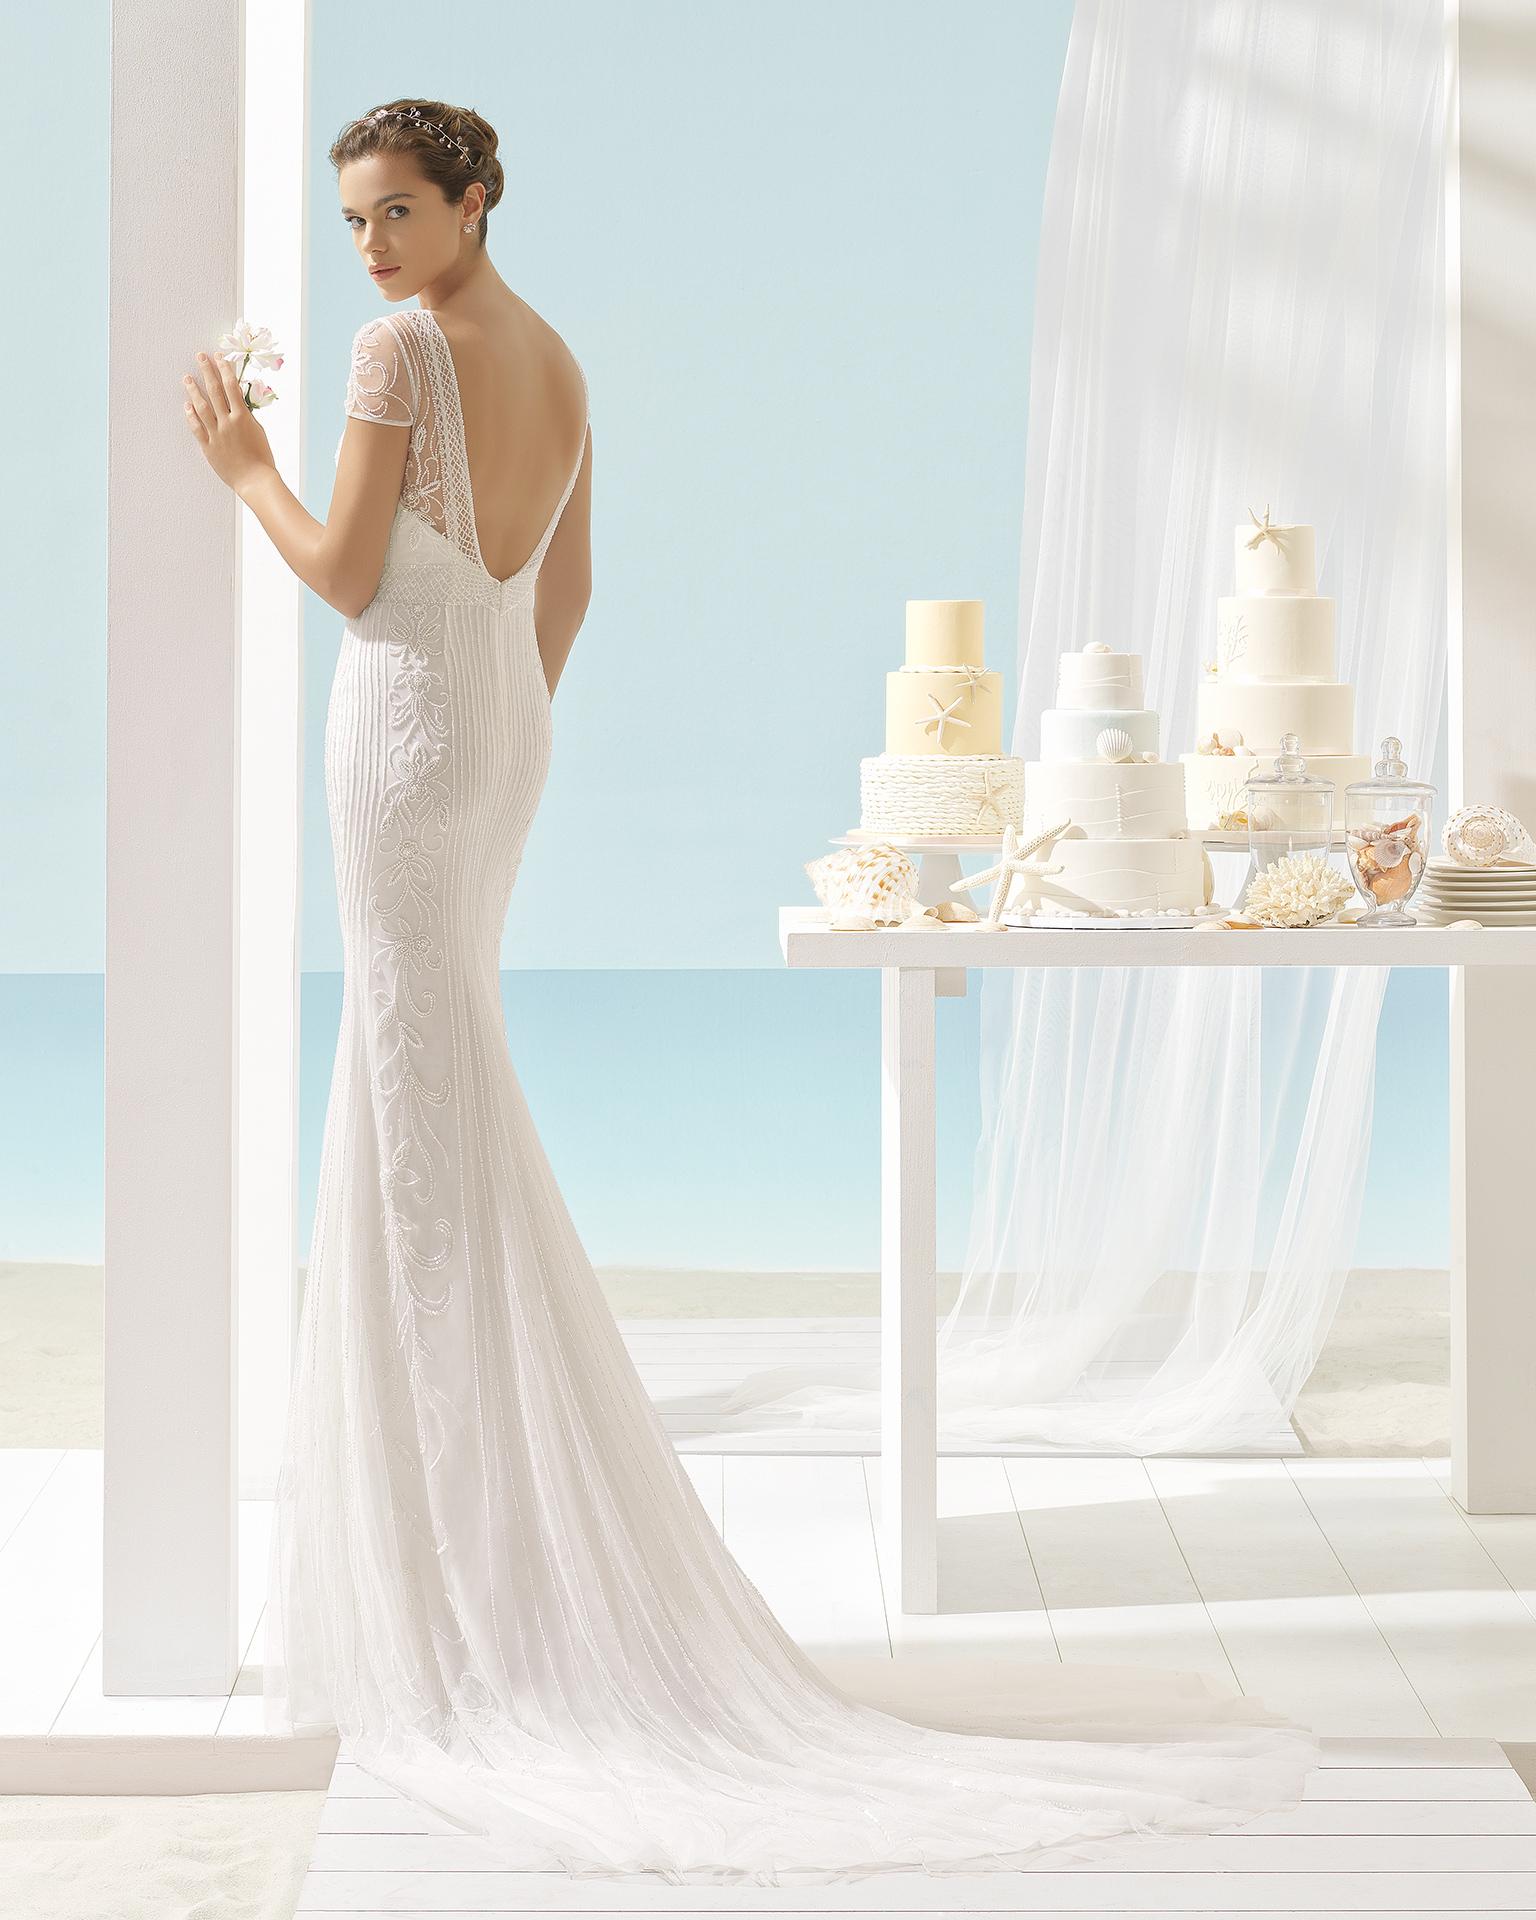 XANDRA wedding dress - Aire Barcelona Beach Wedding 2017